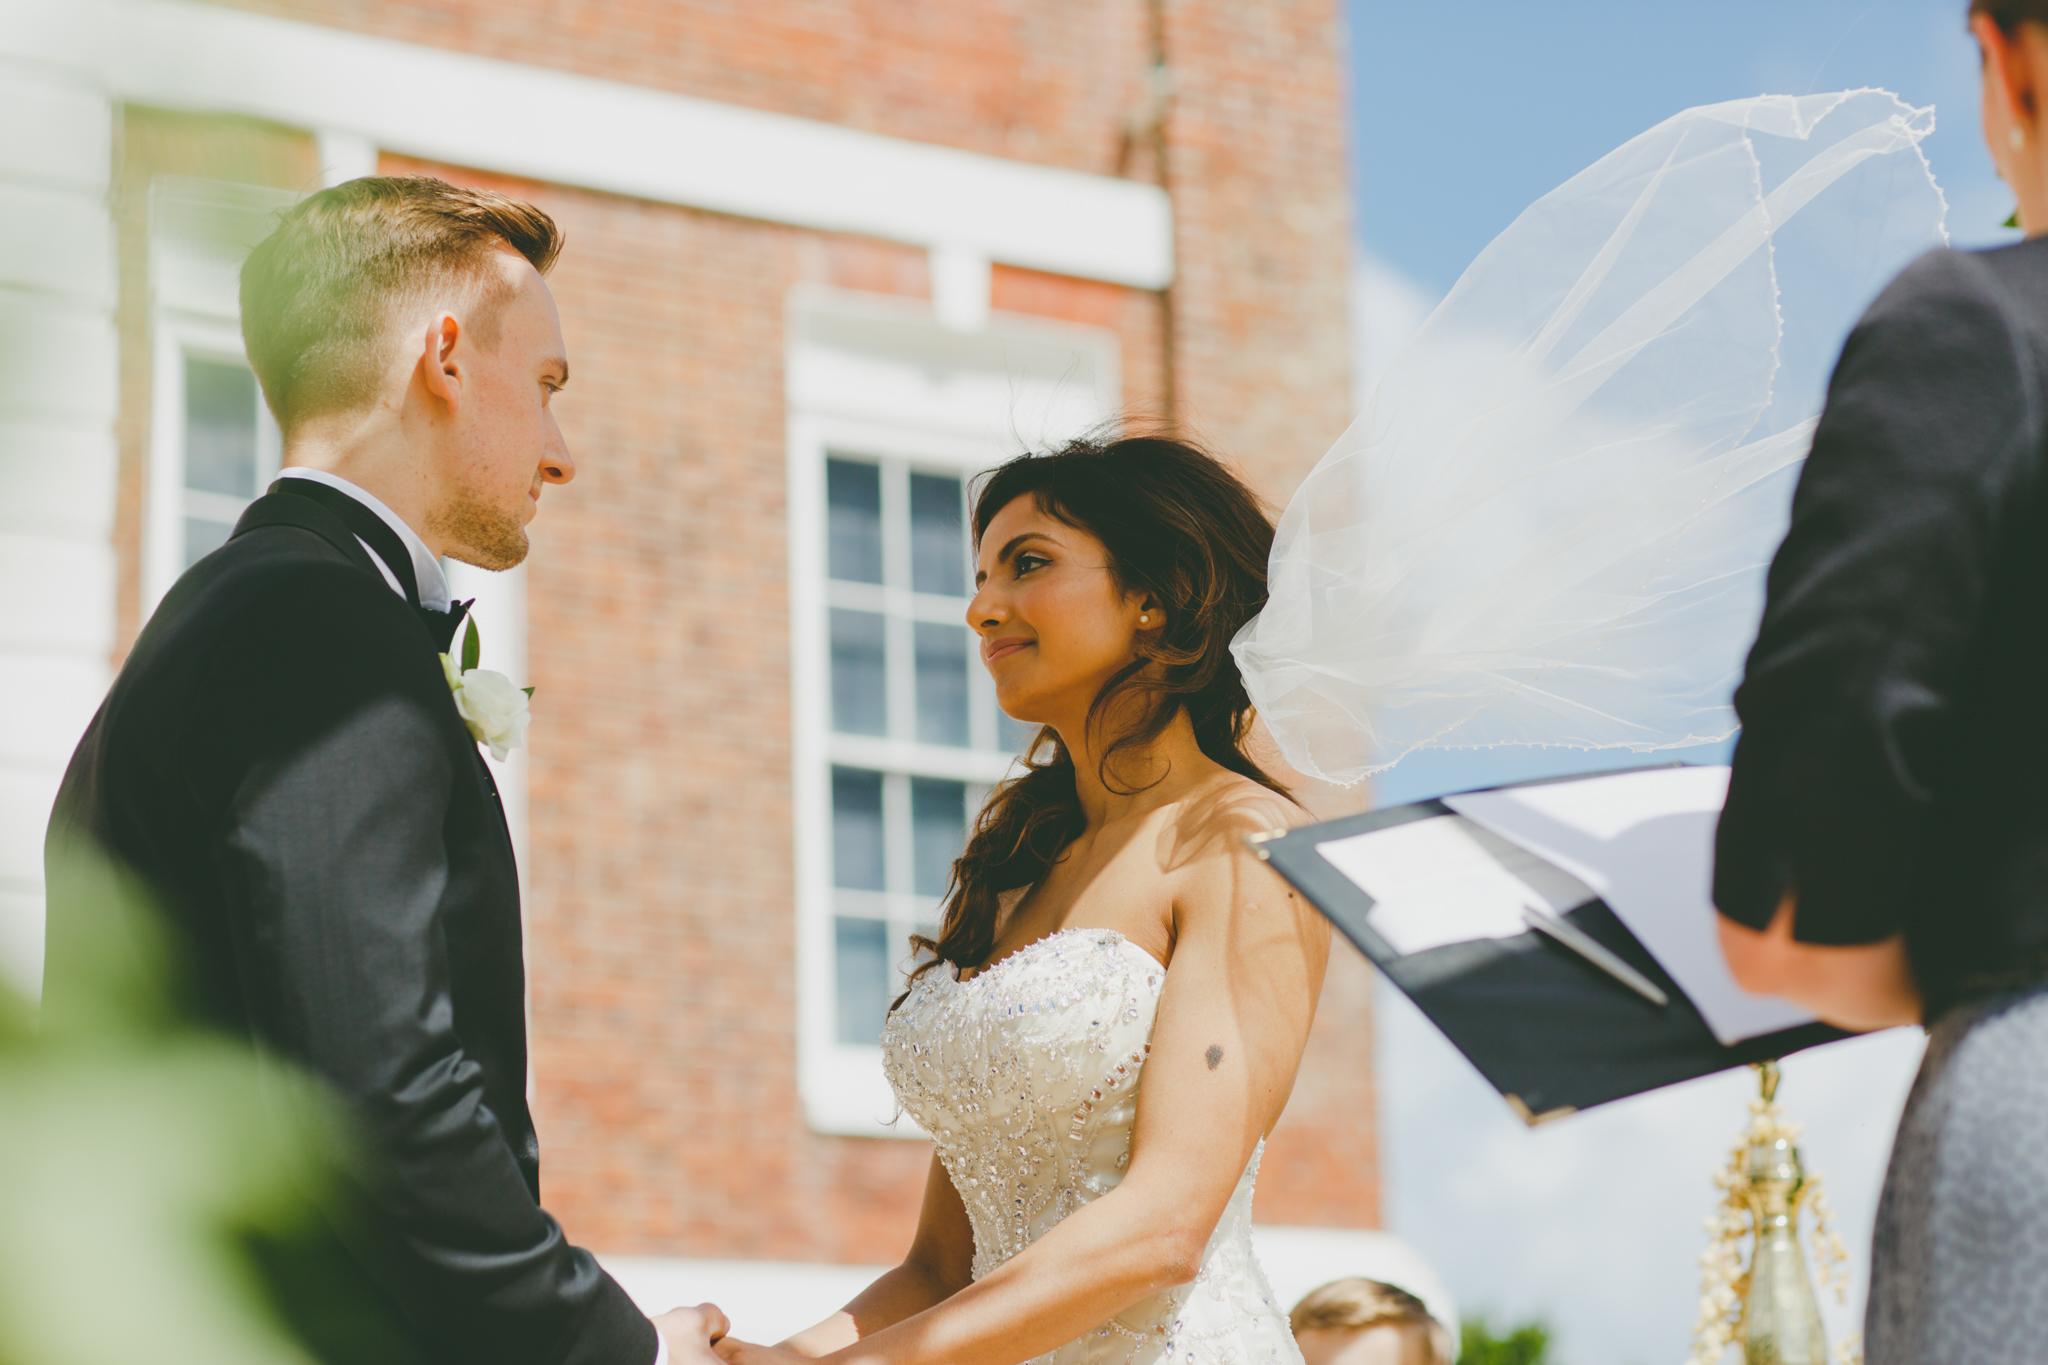 Amy Sampson Devon Wedding Photographer   Ishani and Iain's Buddhist Wedding Ceremony at Pyne's House, Exeter, Devon